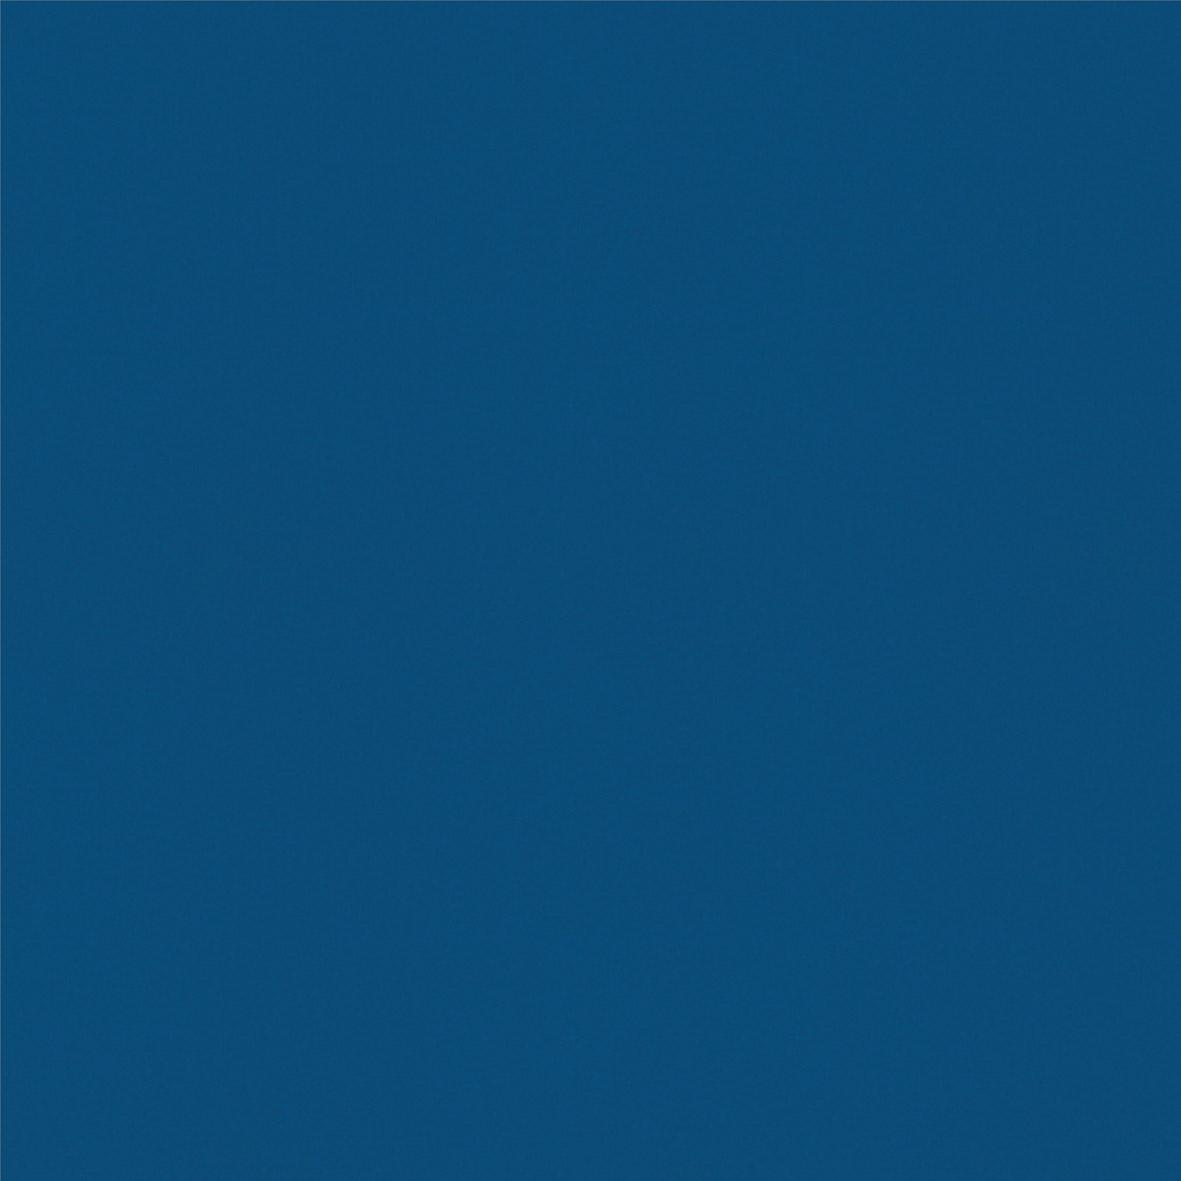 Roller_Swatch_Palette_Atlantic_Blue_RE0049